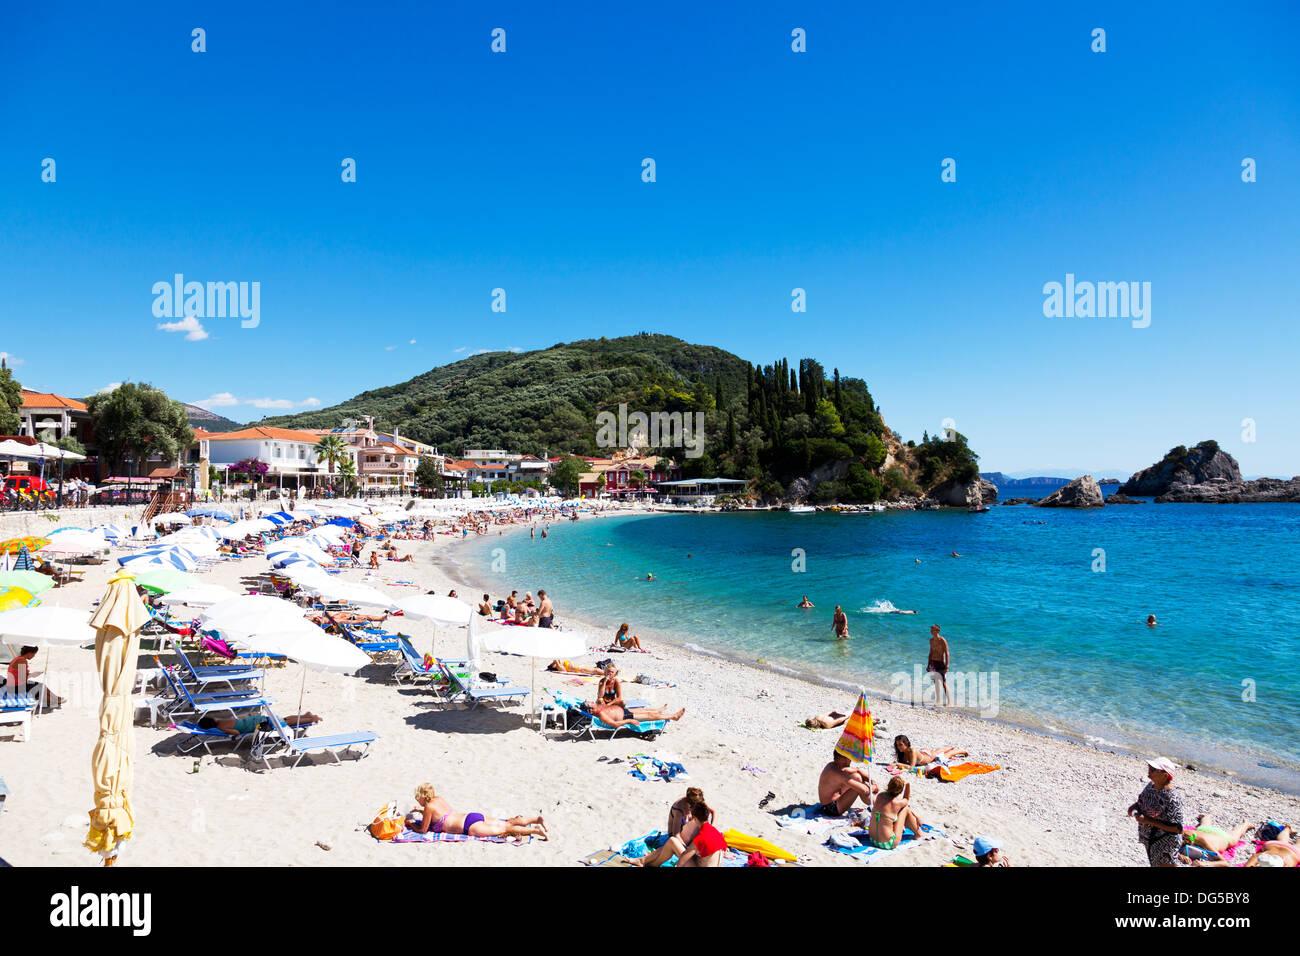 Parga town beach summer parasols sunbathers sun sunny tourists Greek Greece - Stock Image